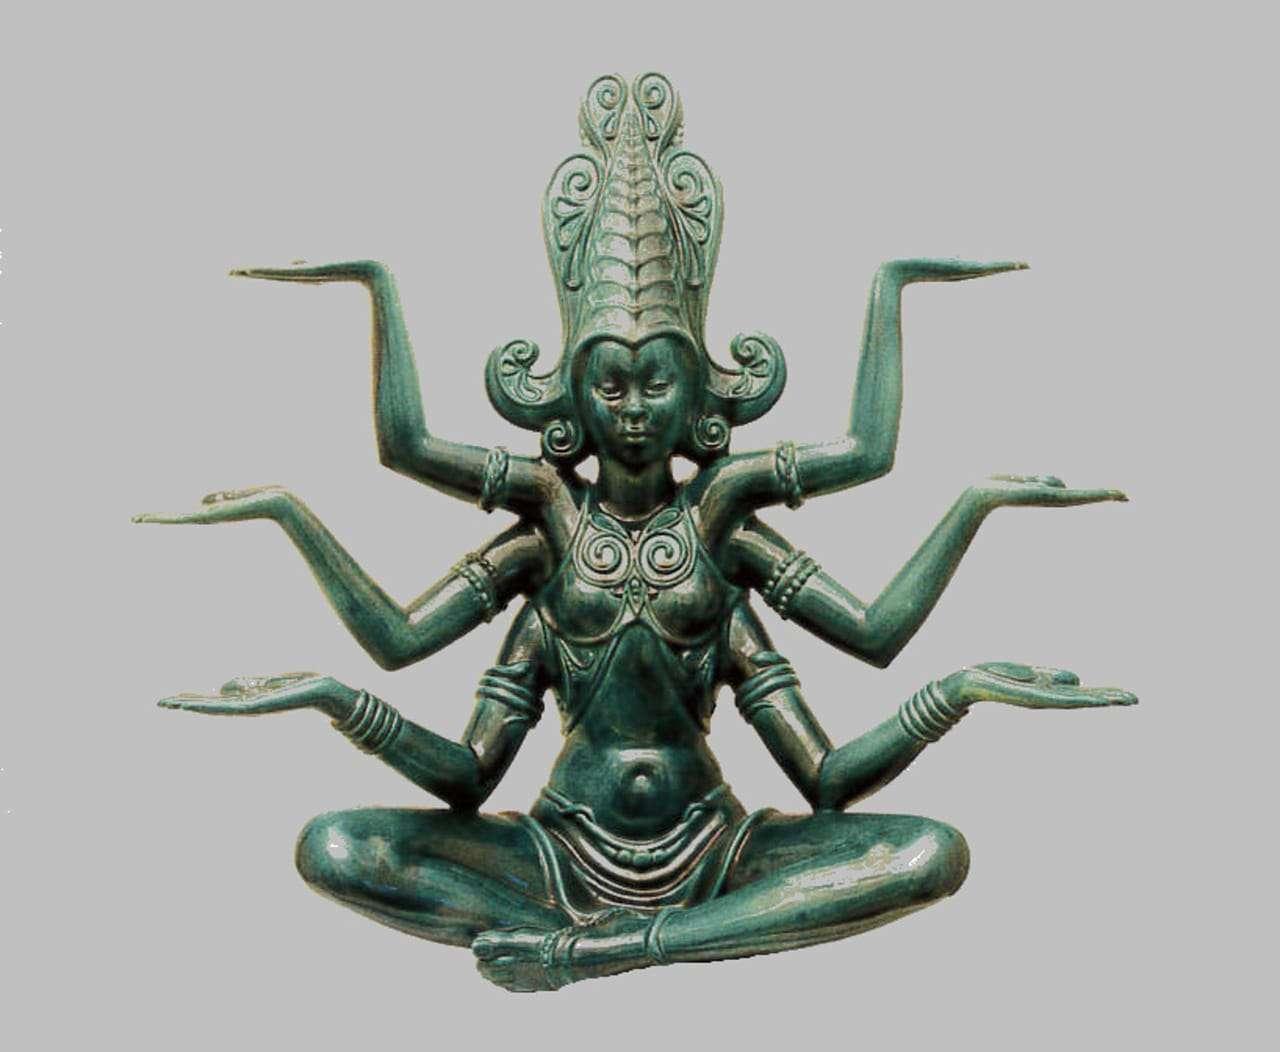 Великая скульптура богини Кали Ленчи Абеле Якопи